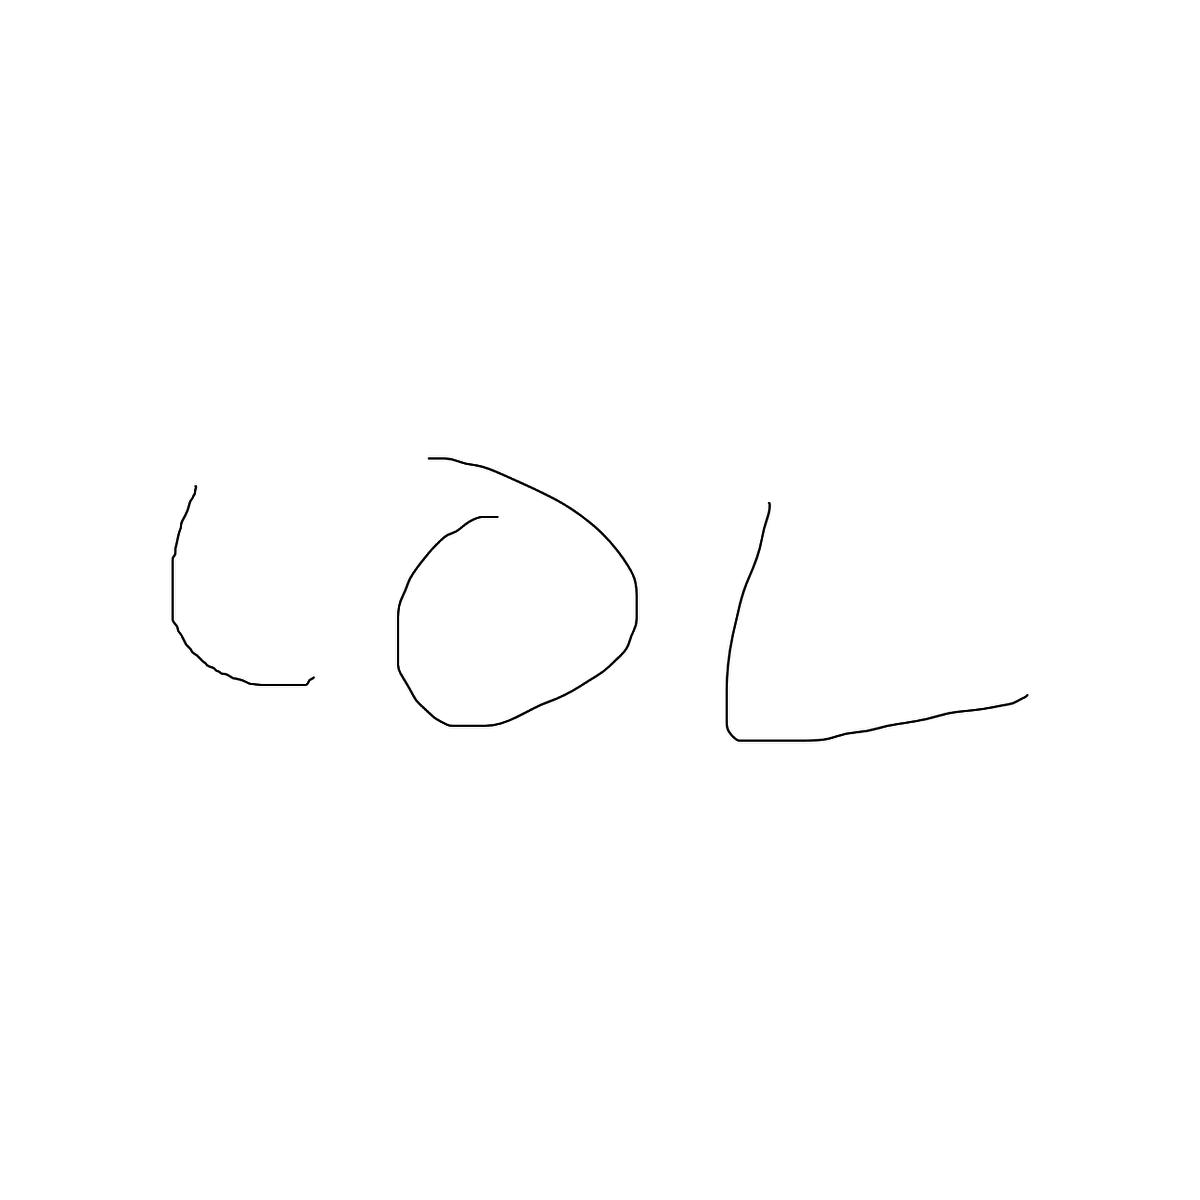 BAAAM drawing#6377 lat:54.6818351745605500lng: 25.2716350555419920